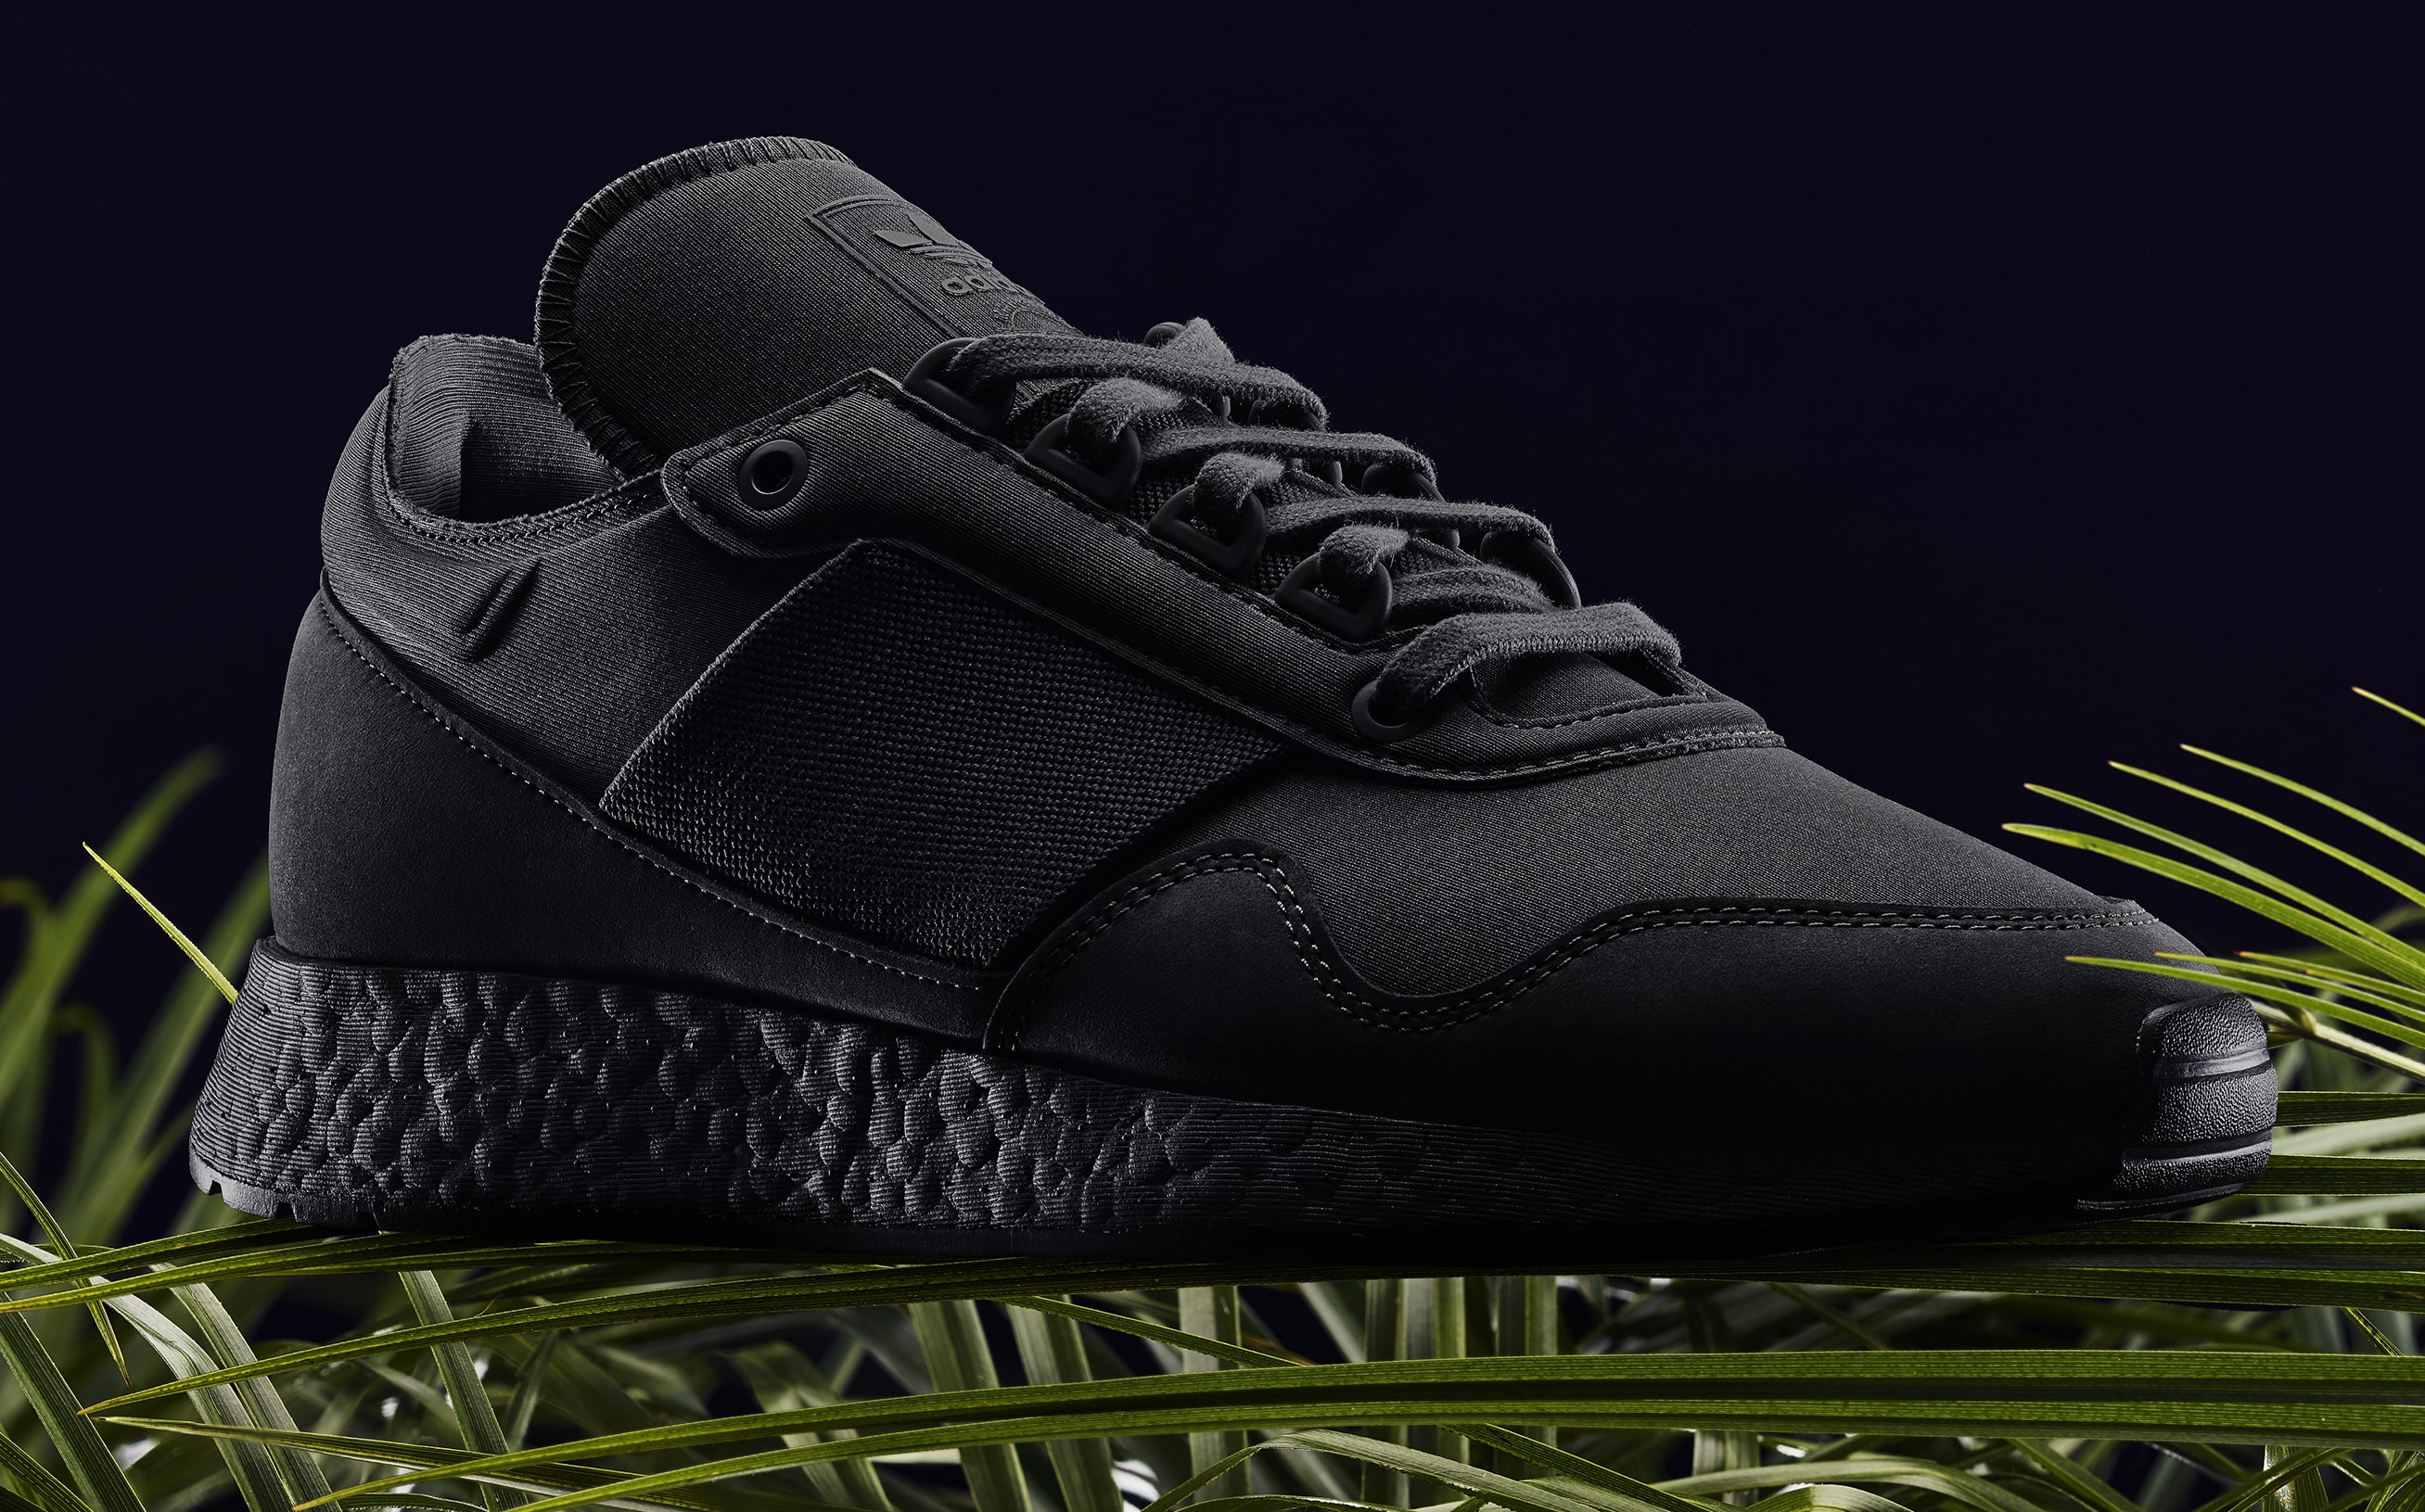 Daniel Arsham x Adidas New York Present DB1971 (Angle)